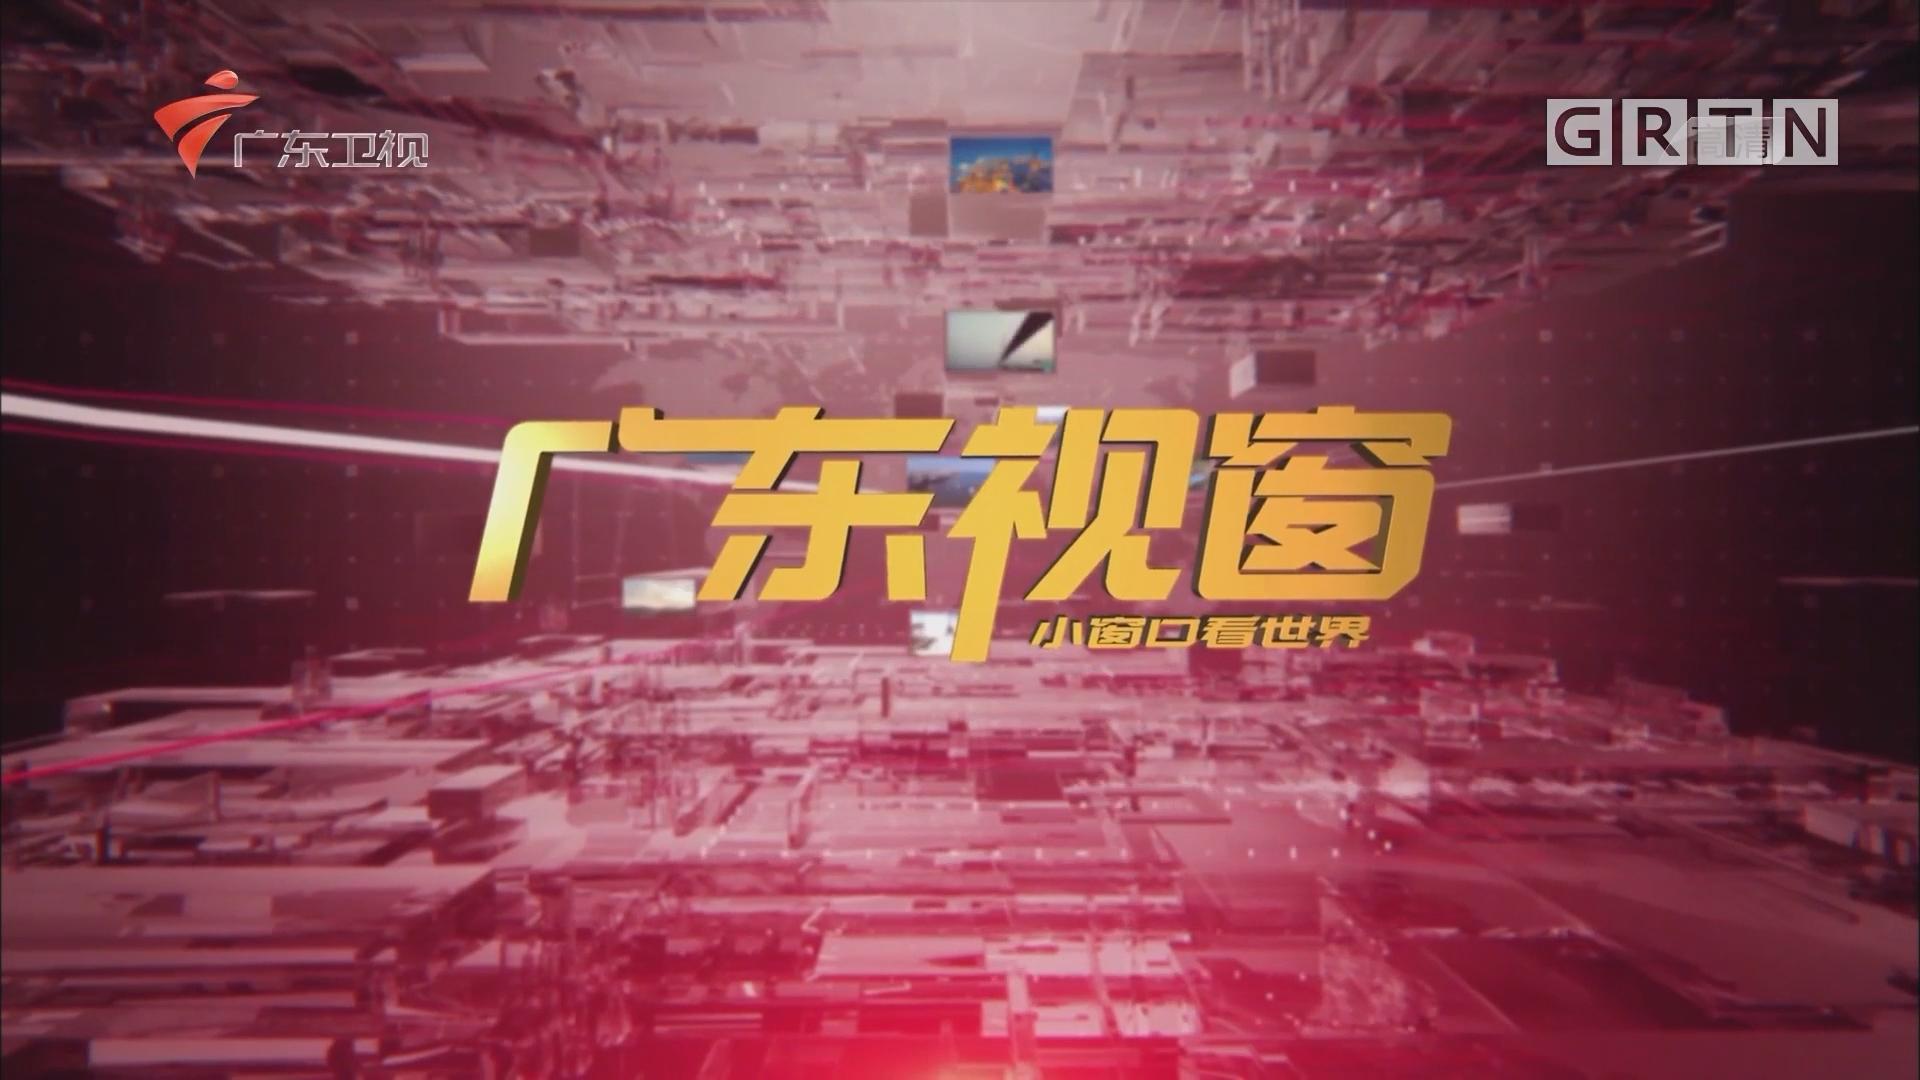 [HD][2018-10-06]广东视窗:广州:天河区治违攻坚挂图作战 开启最严治理模式